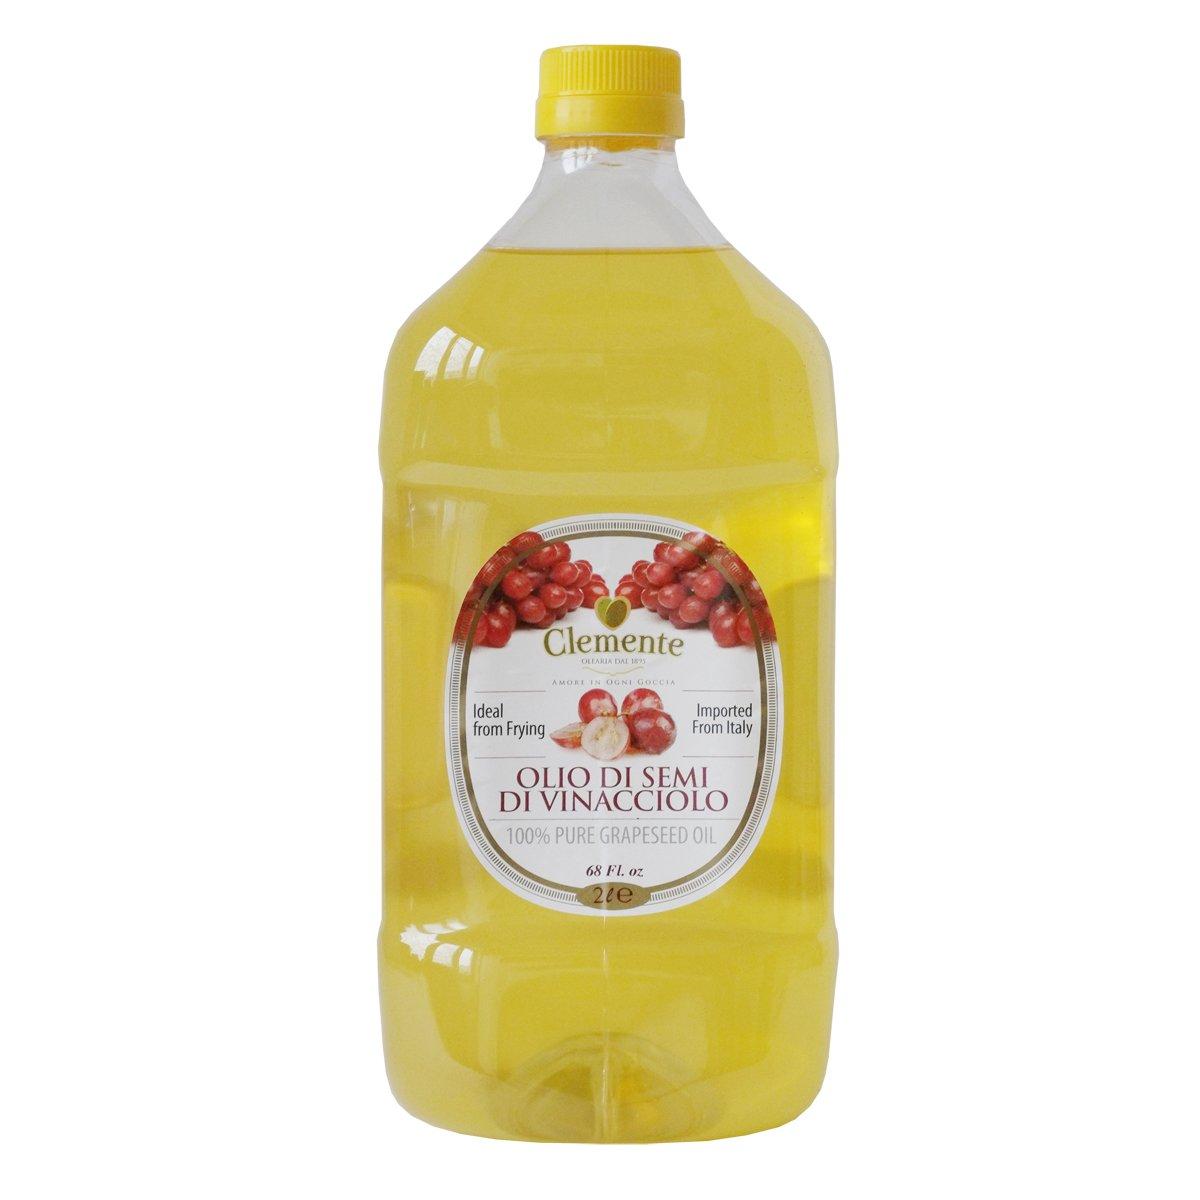 Clemente Italian 100% Pure Grapeseed Oil 68 fl oz